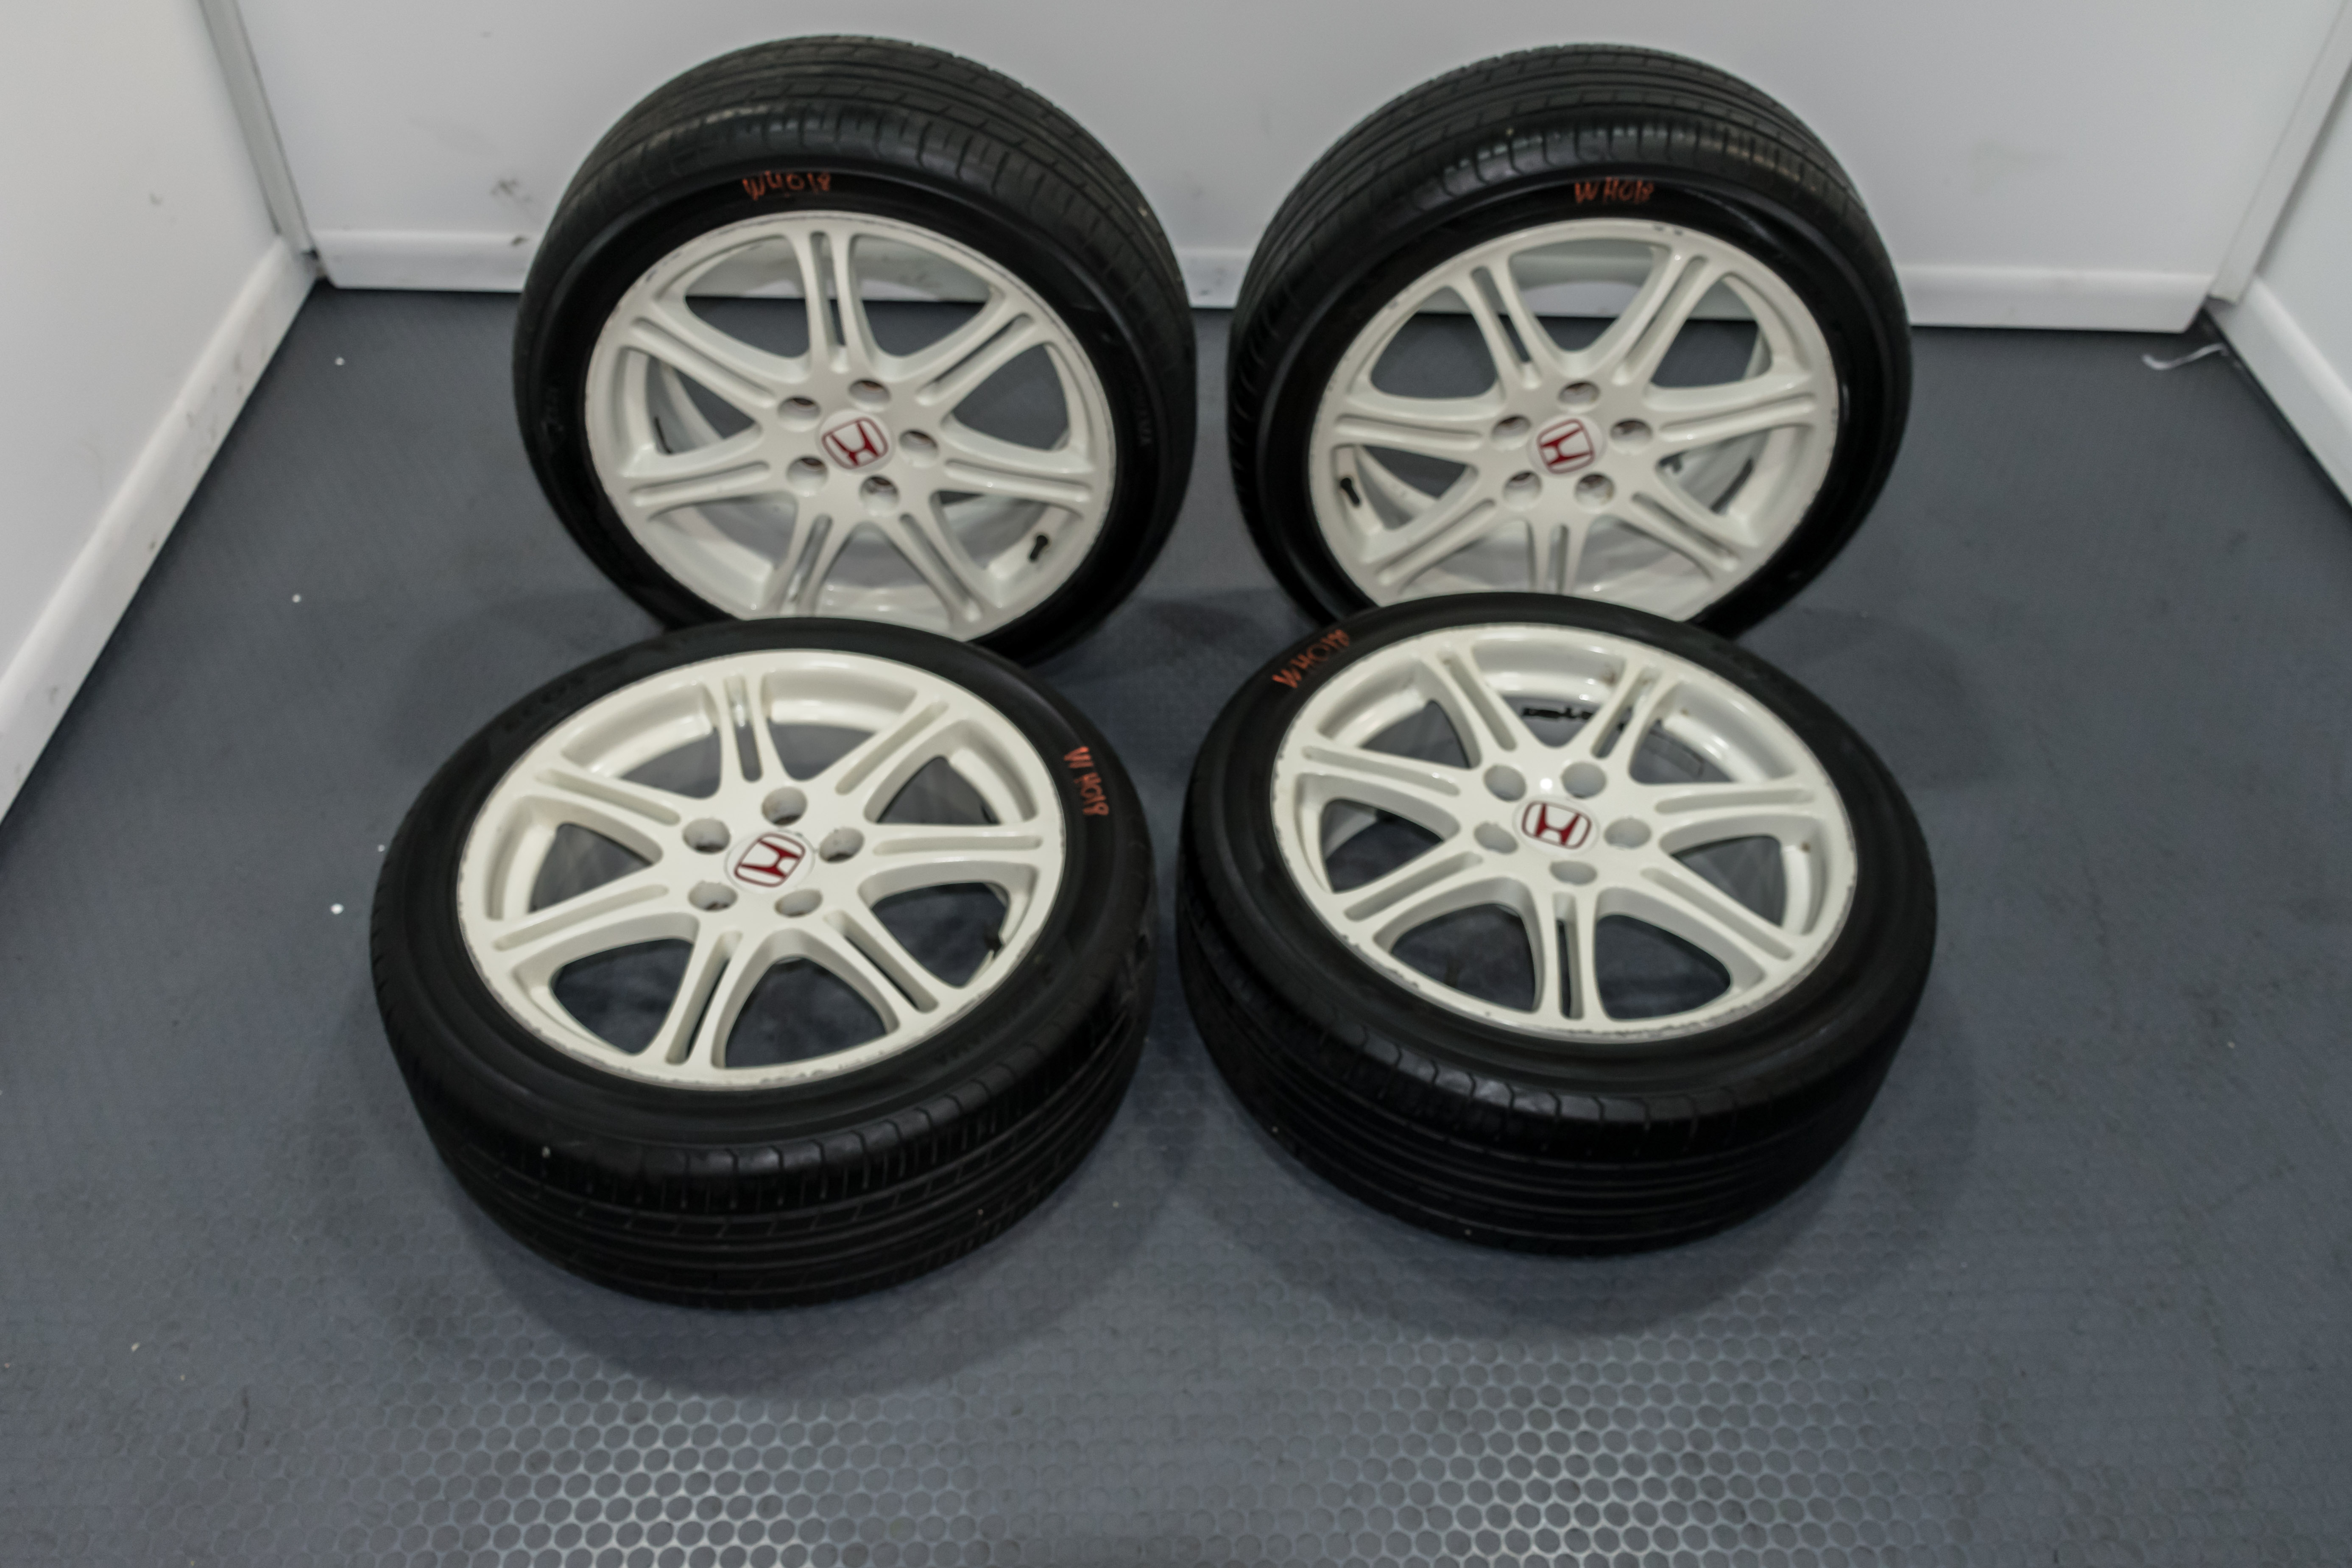 ep3 wheels type civic jdm honda 17x7 5x114 sold oem